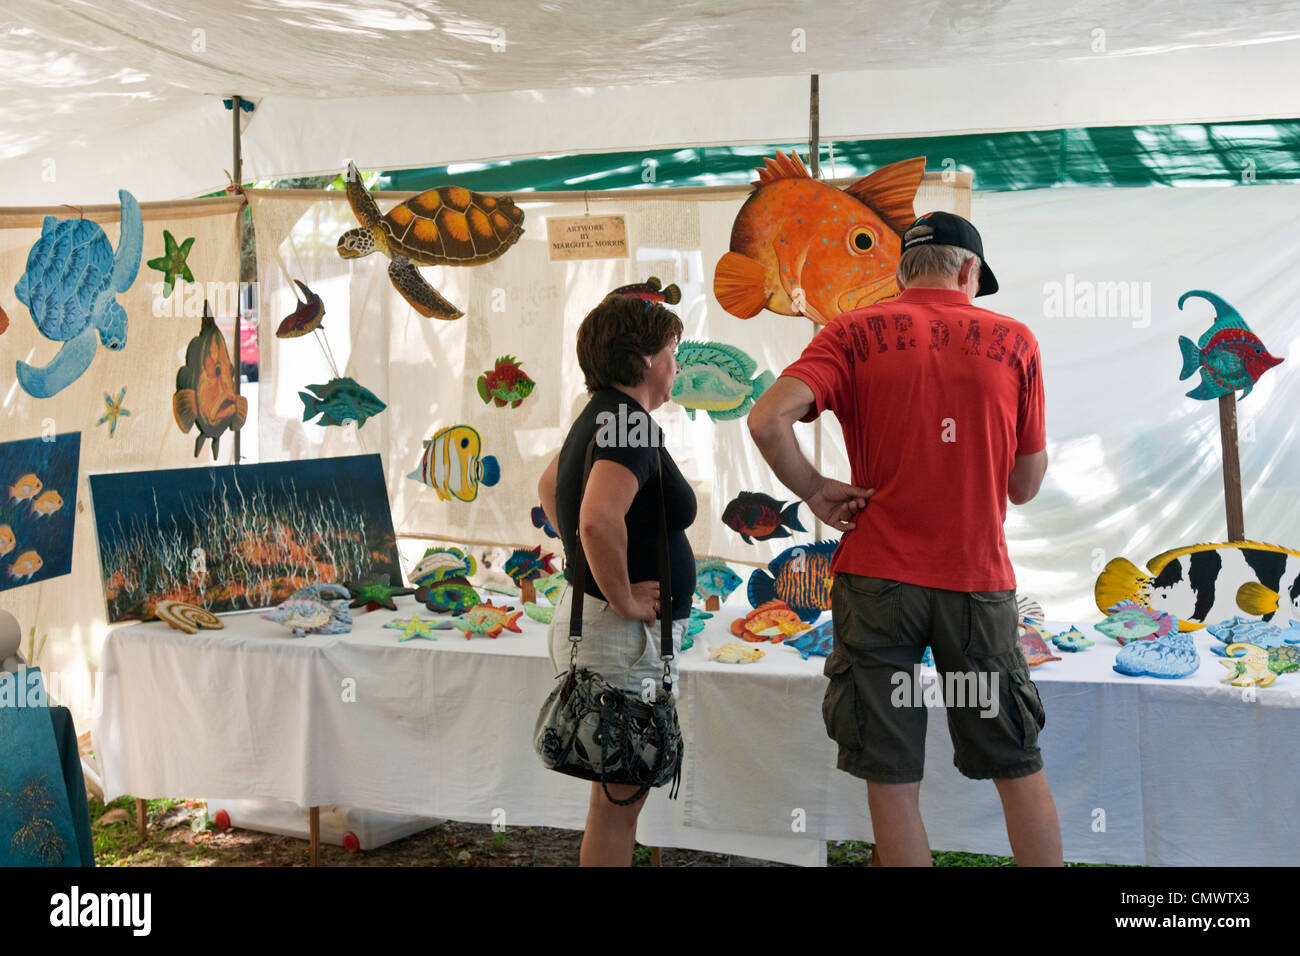 Couple shopping for handicrafts at Sunday Markets. Port Douglas, Queensland, Australia - Stock Image